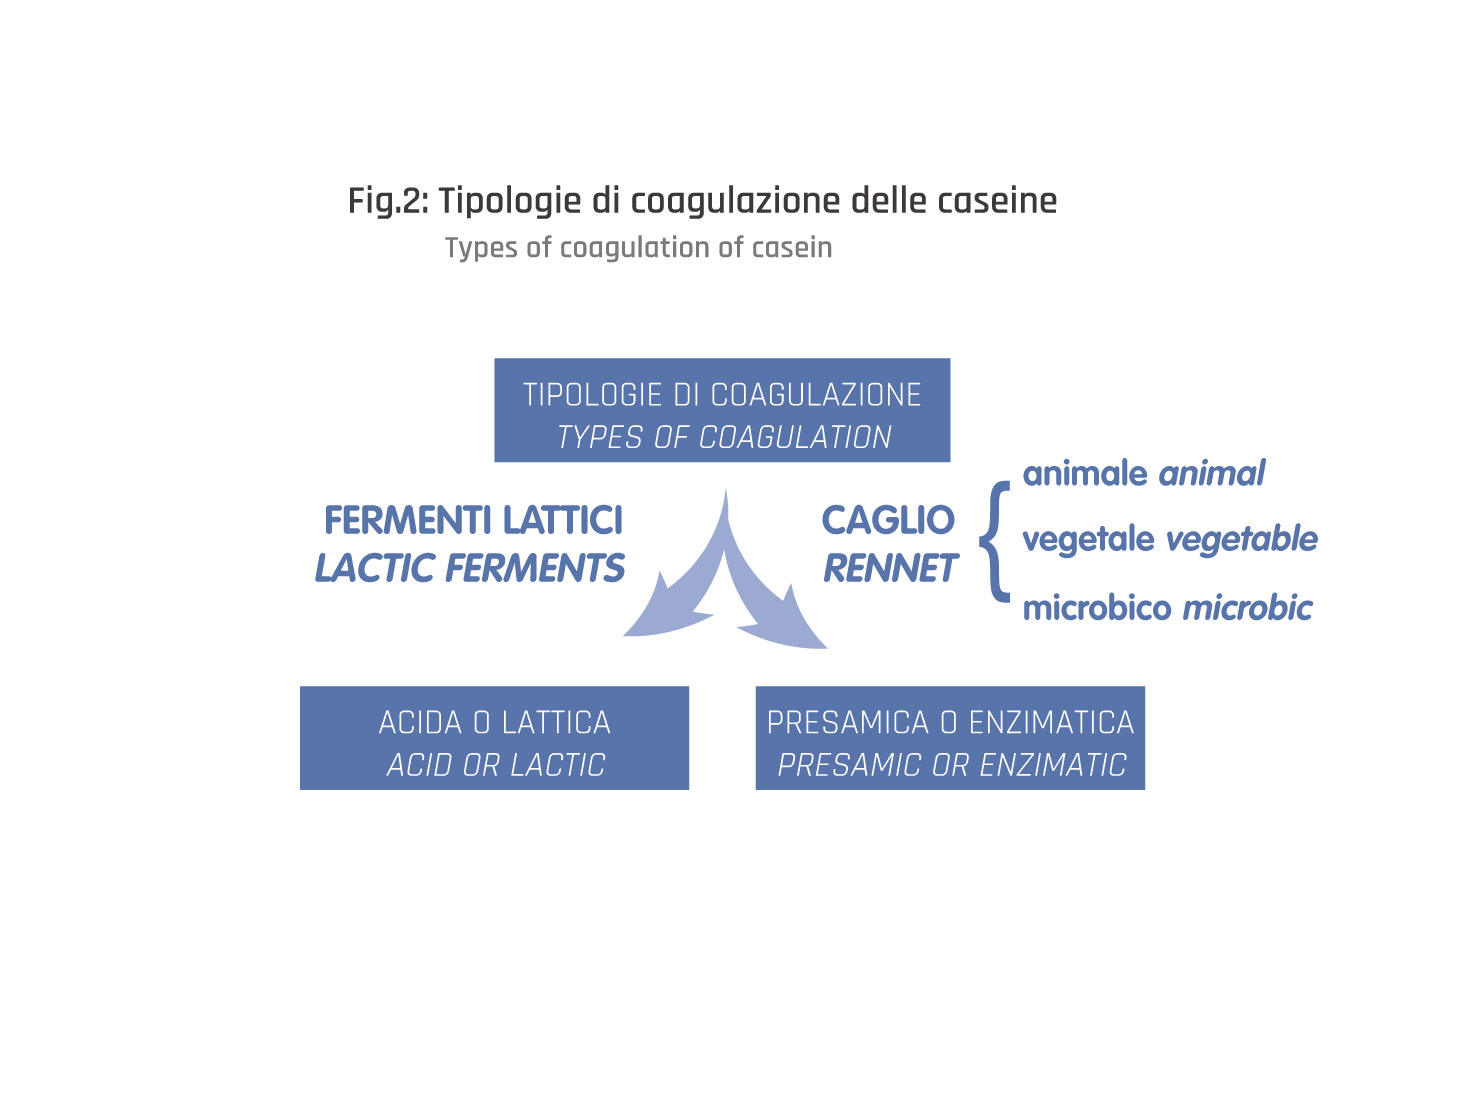 Schema tipologie di coagulazione